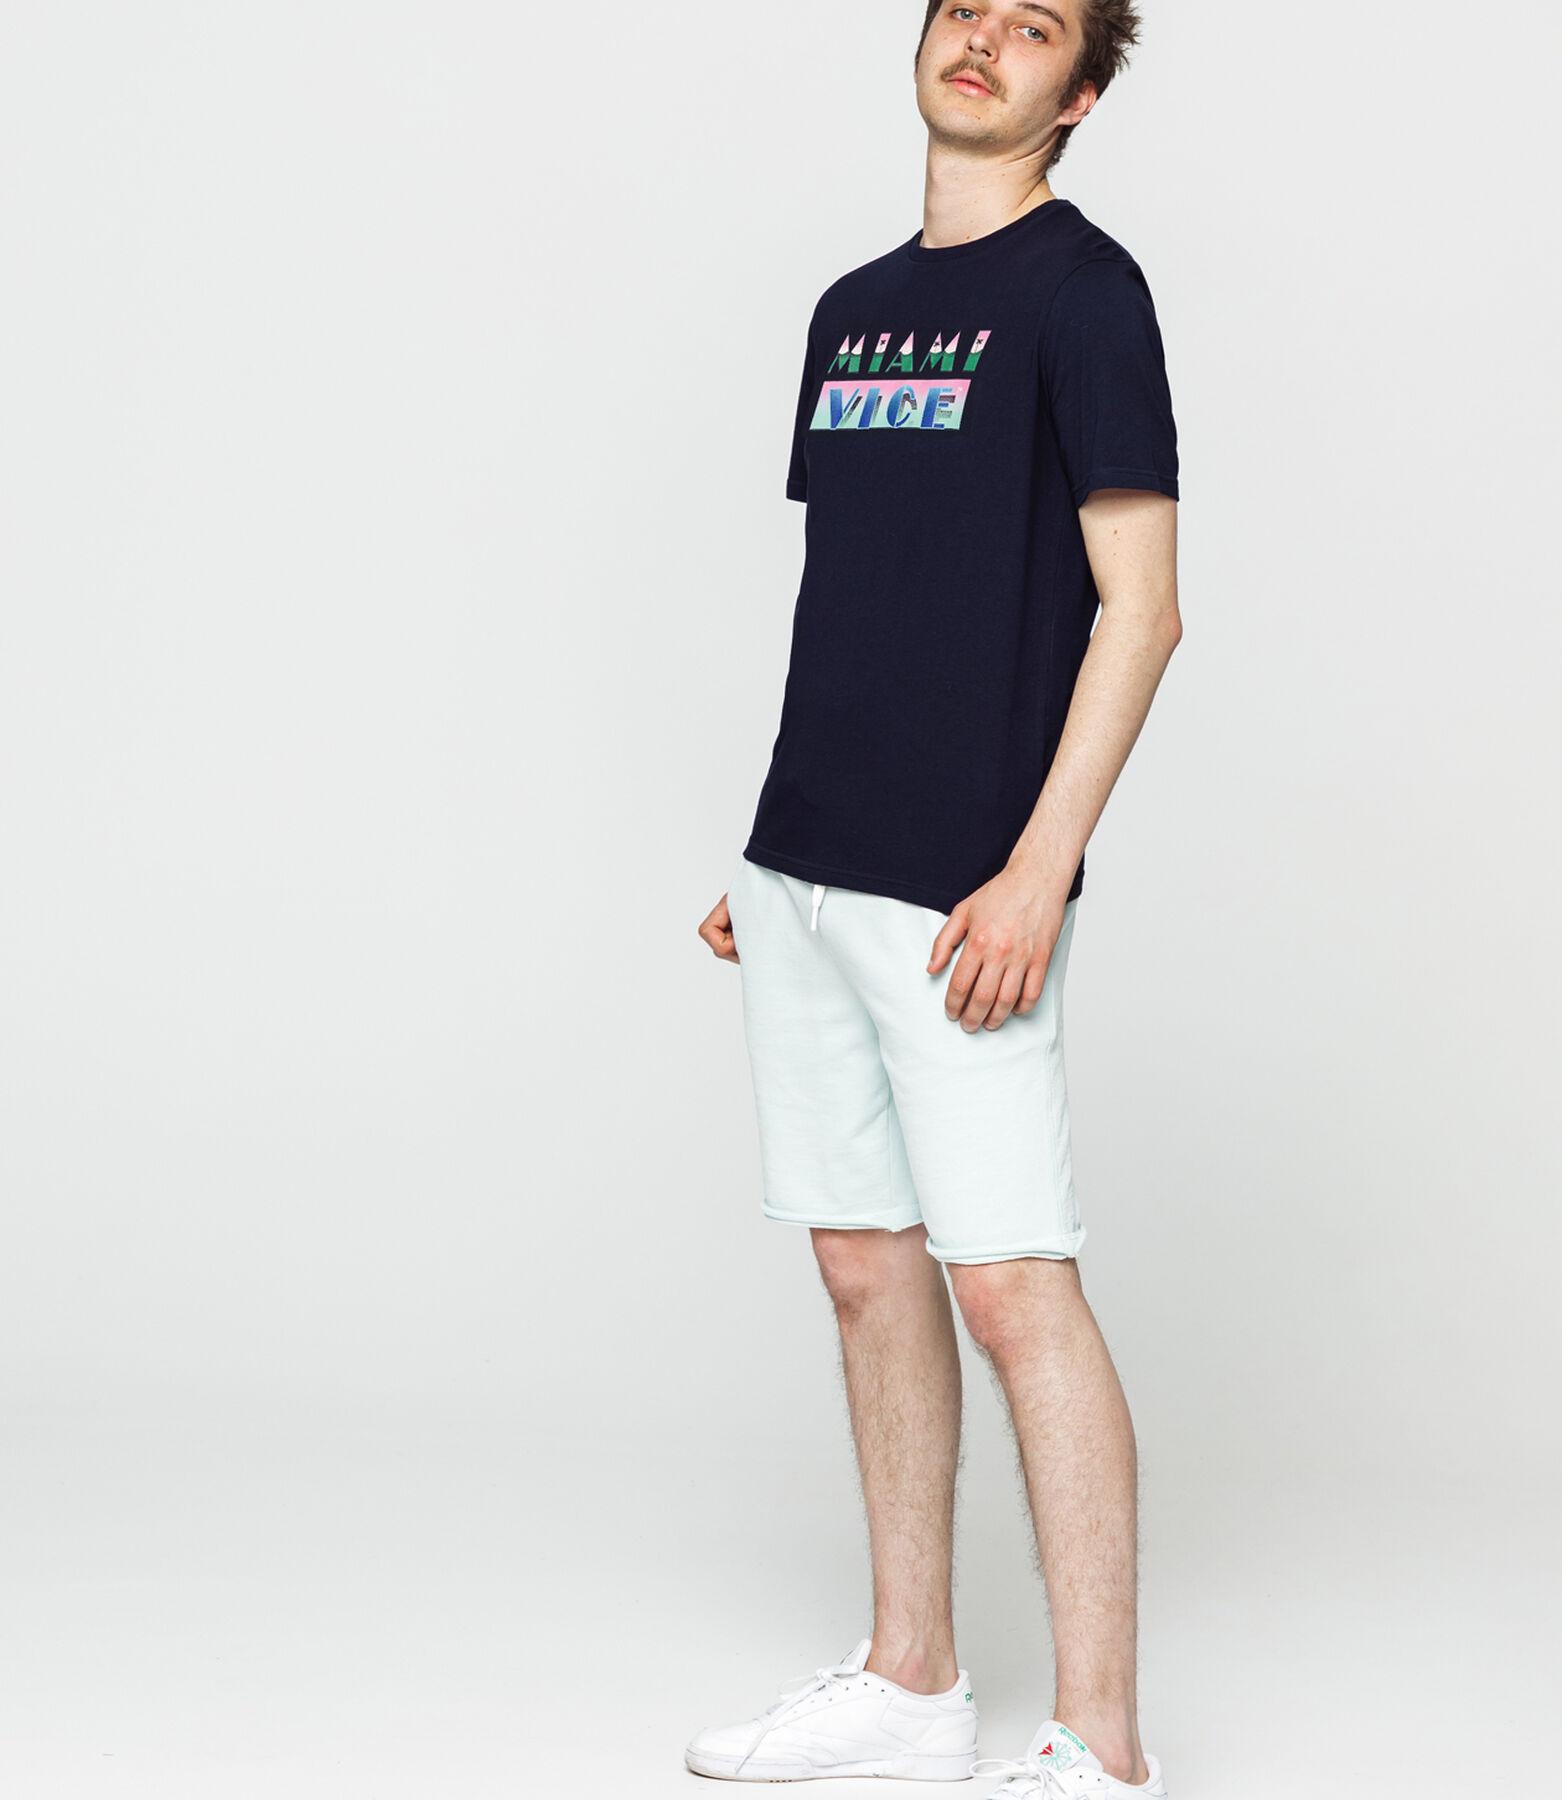 T-shirt Miami vice